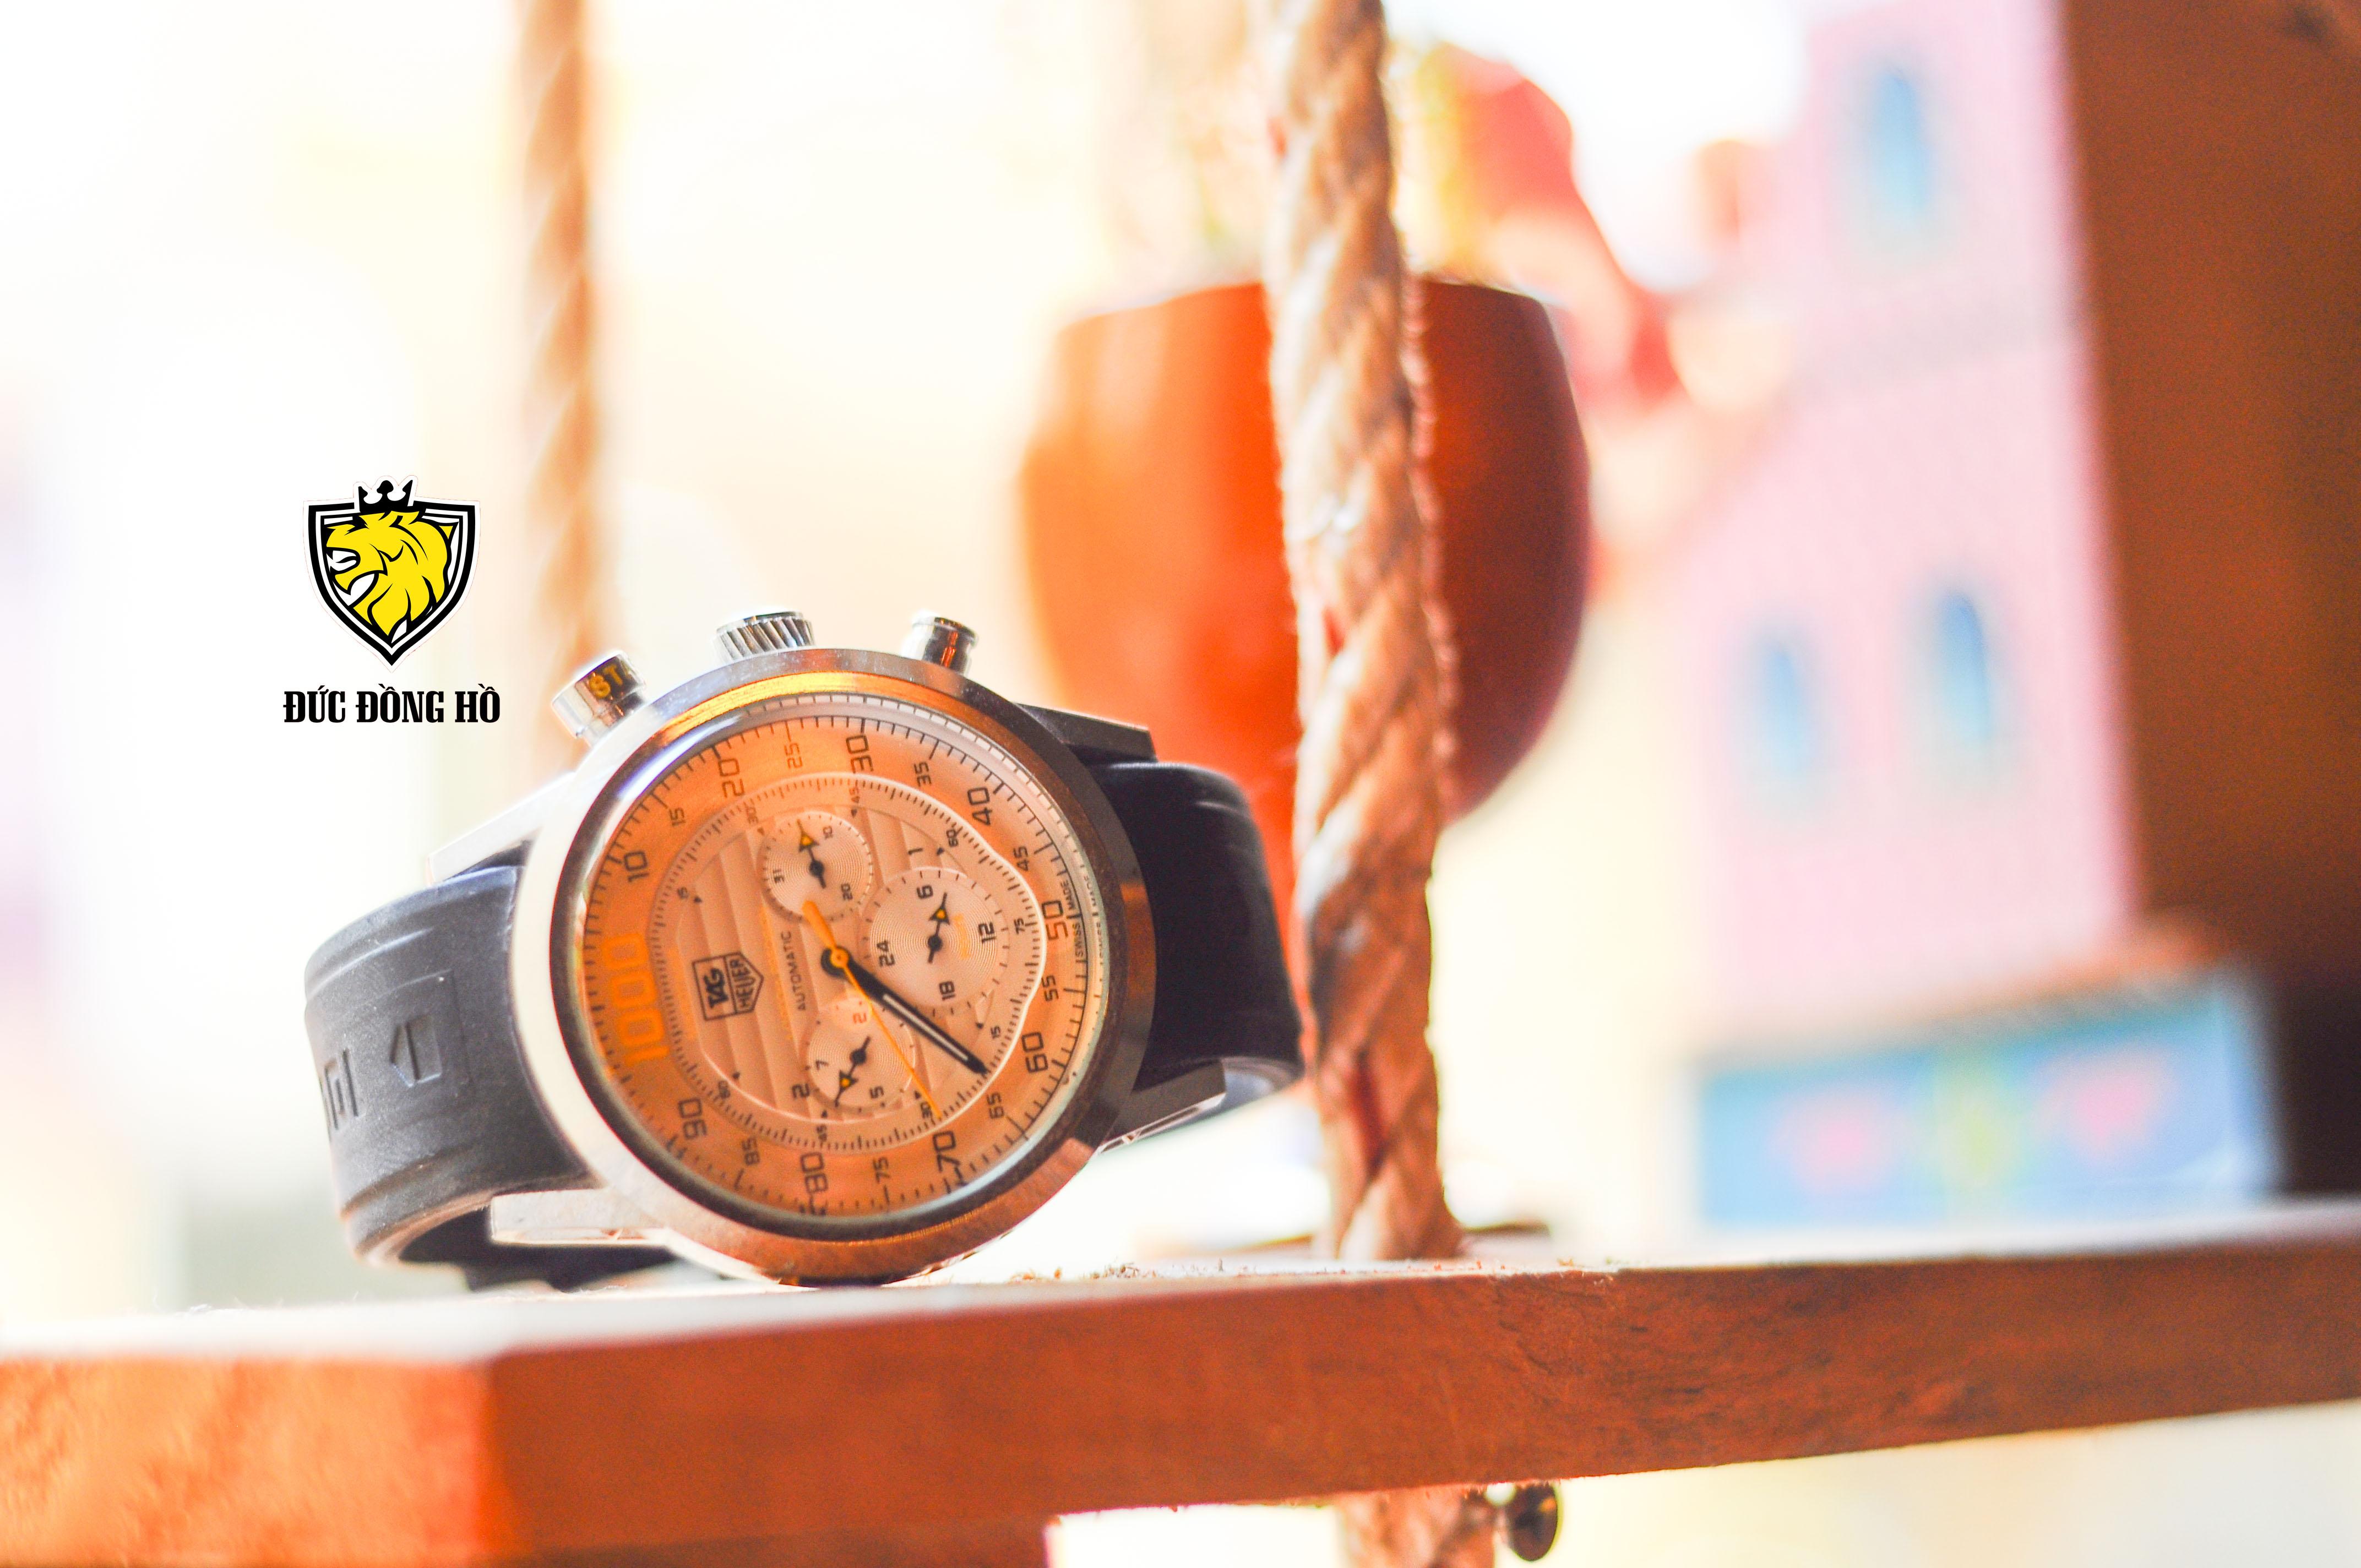 Đồng hồ Tag Heuer Nam 102.1